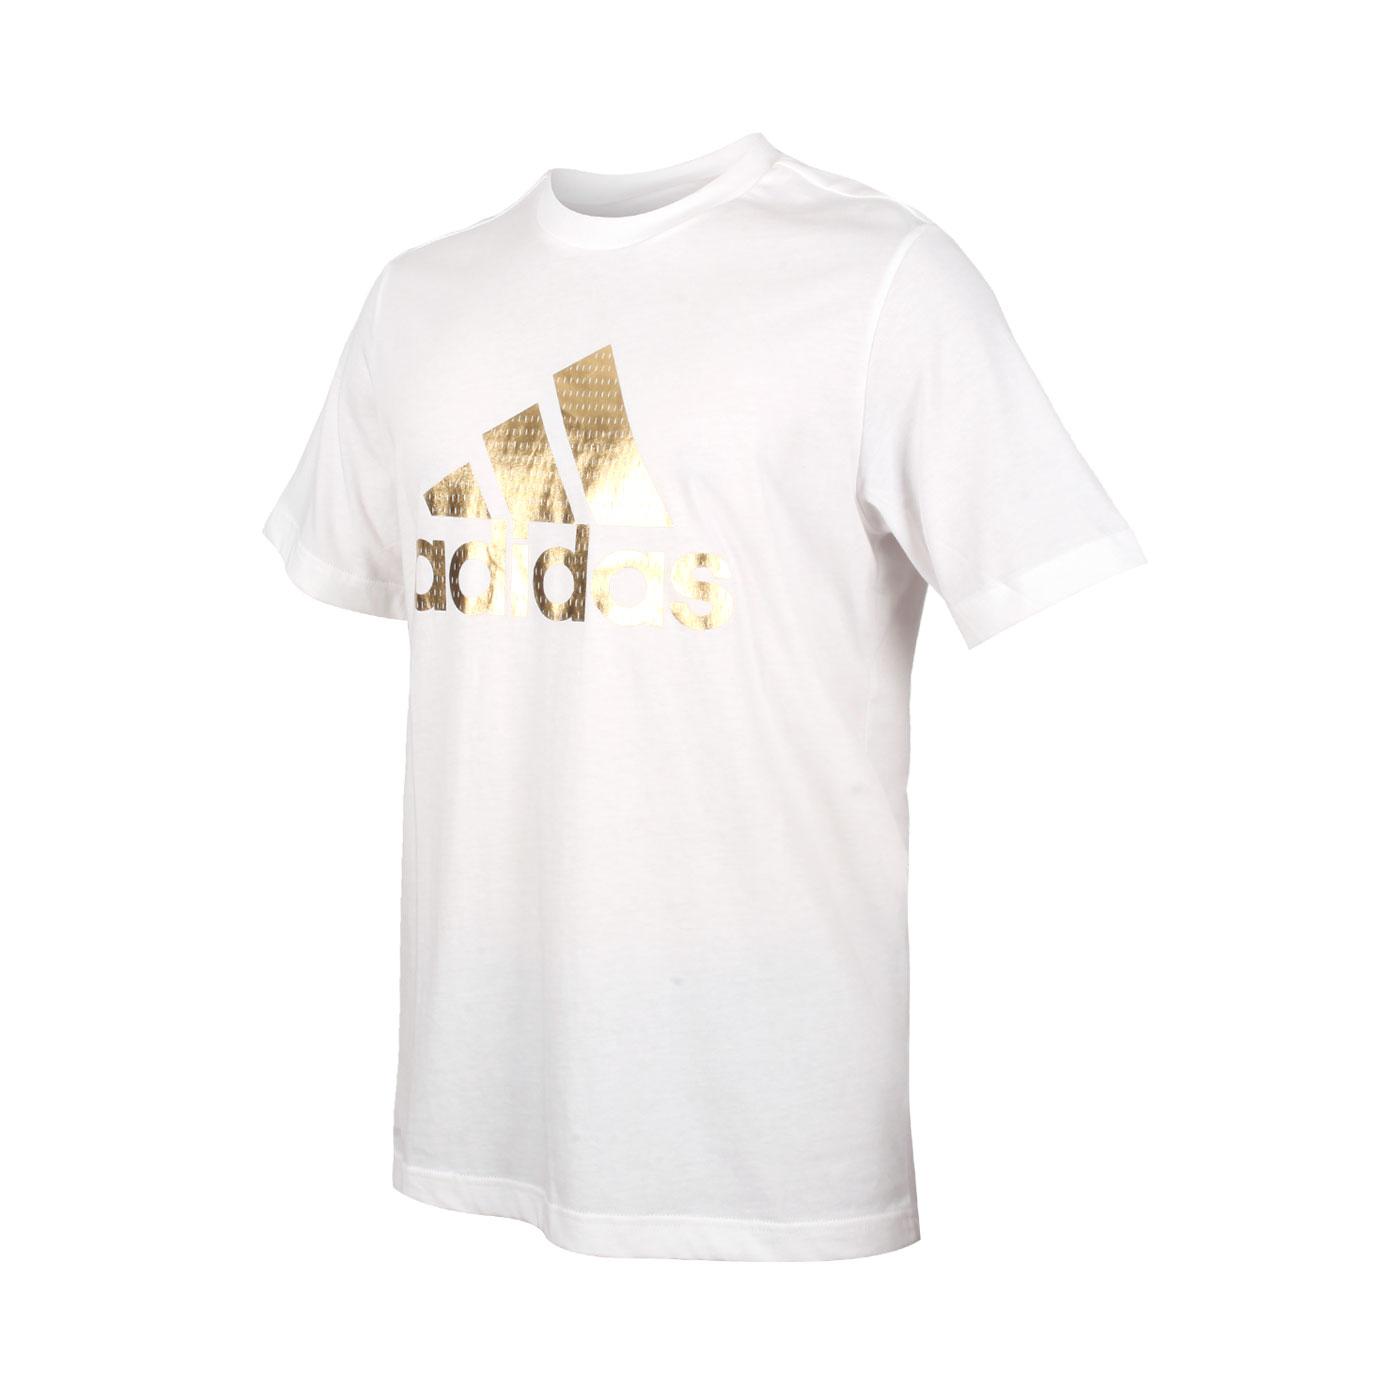 ADIDAS 男款短袖T恤 GE4688 - 白金